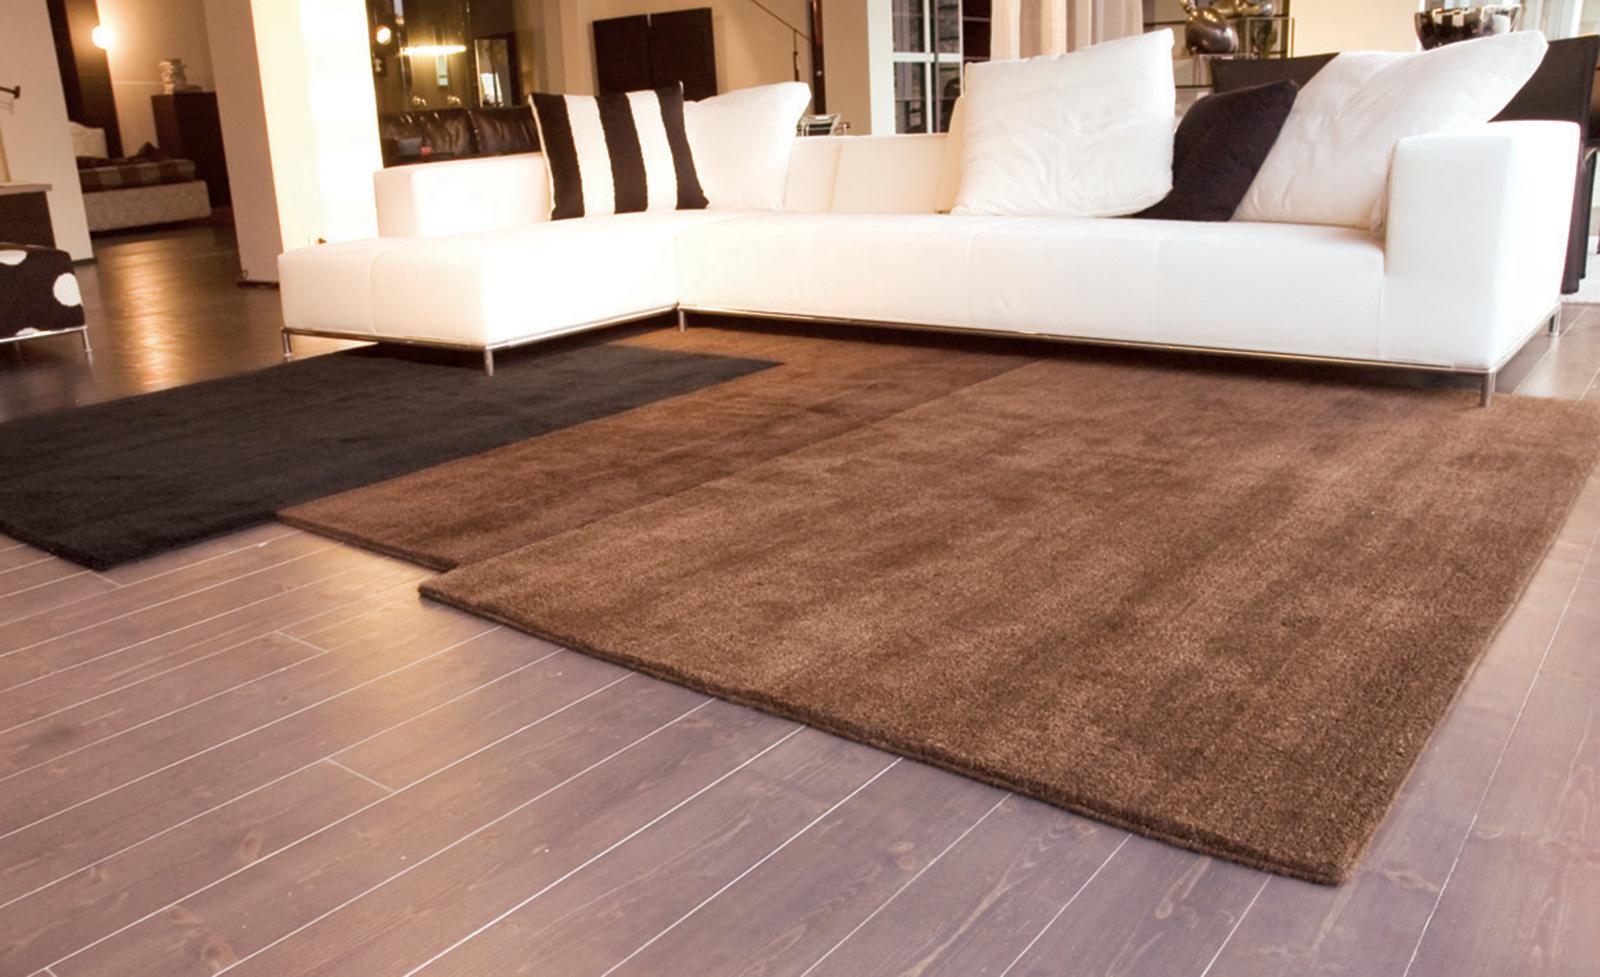 Collezione celebrity tappeti renzi santa arredamenti - Alfombras para sala ...